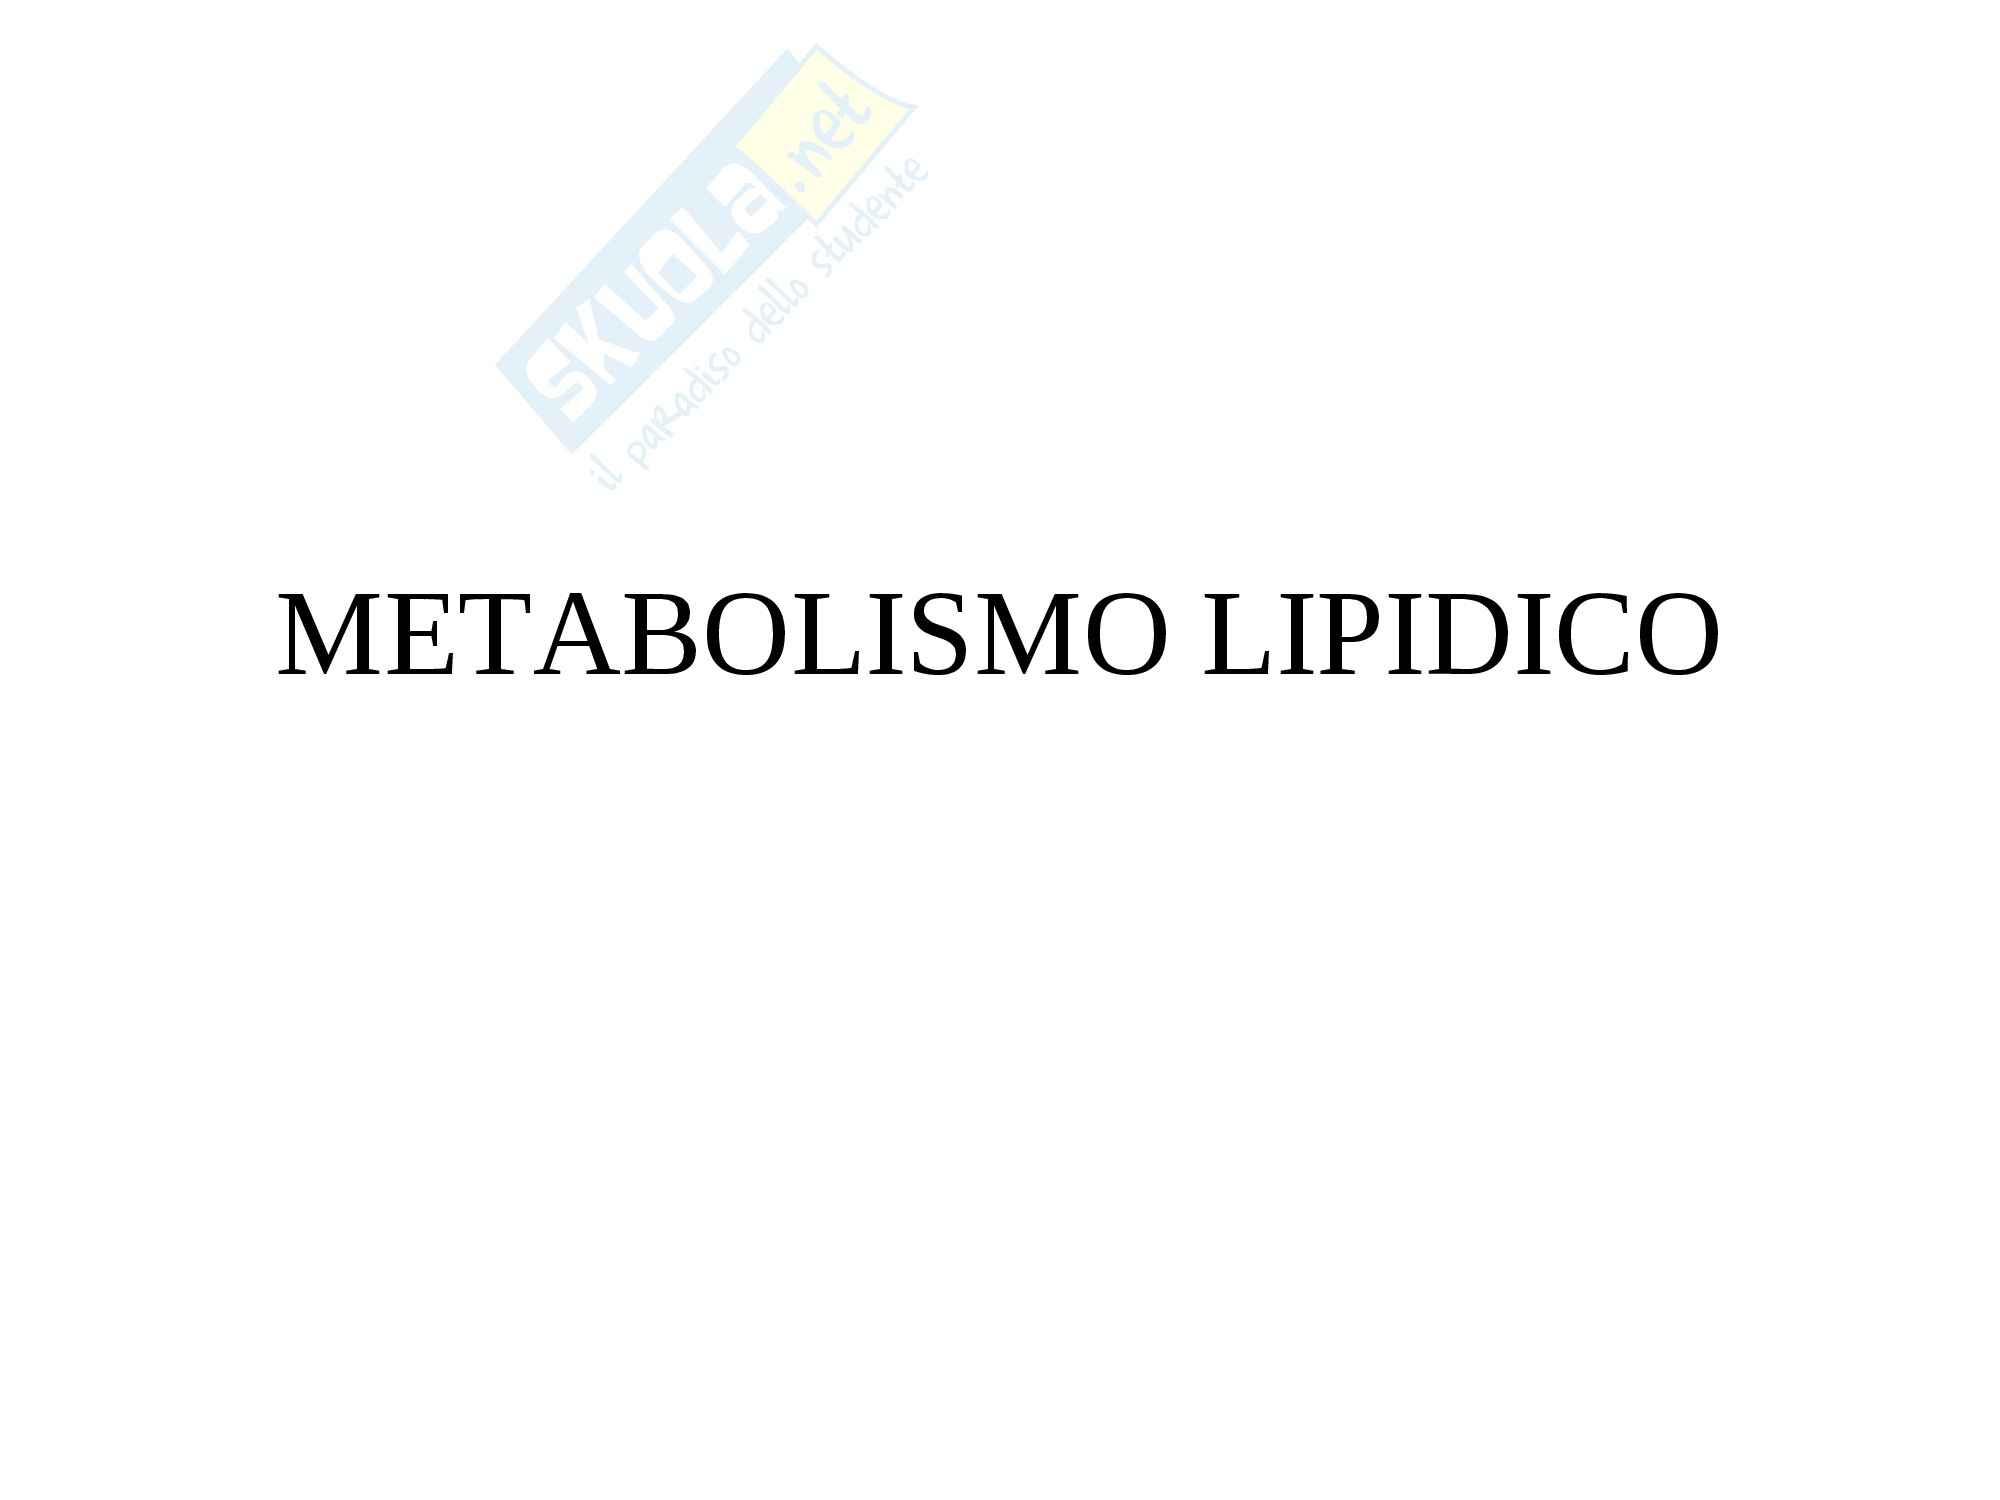 Biochimica - metabolismo lipidico